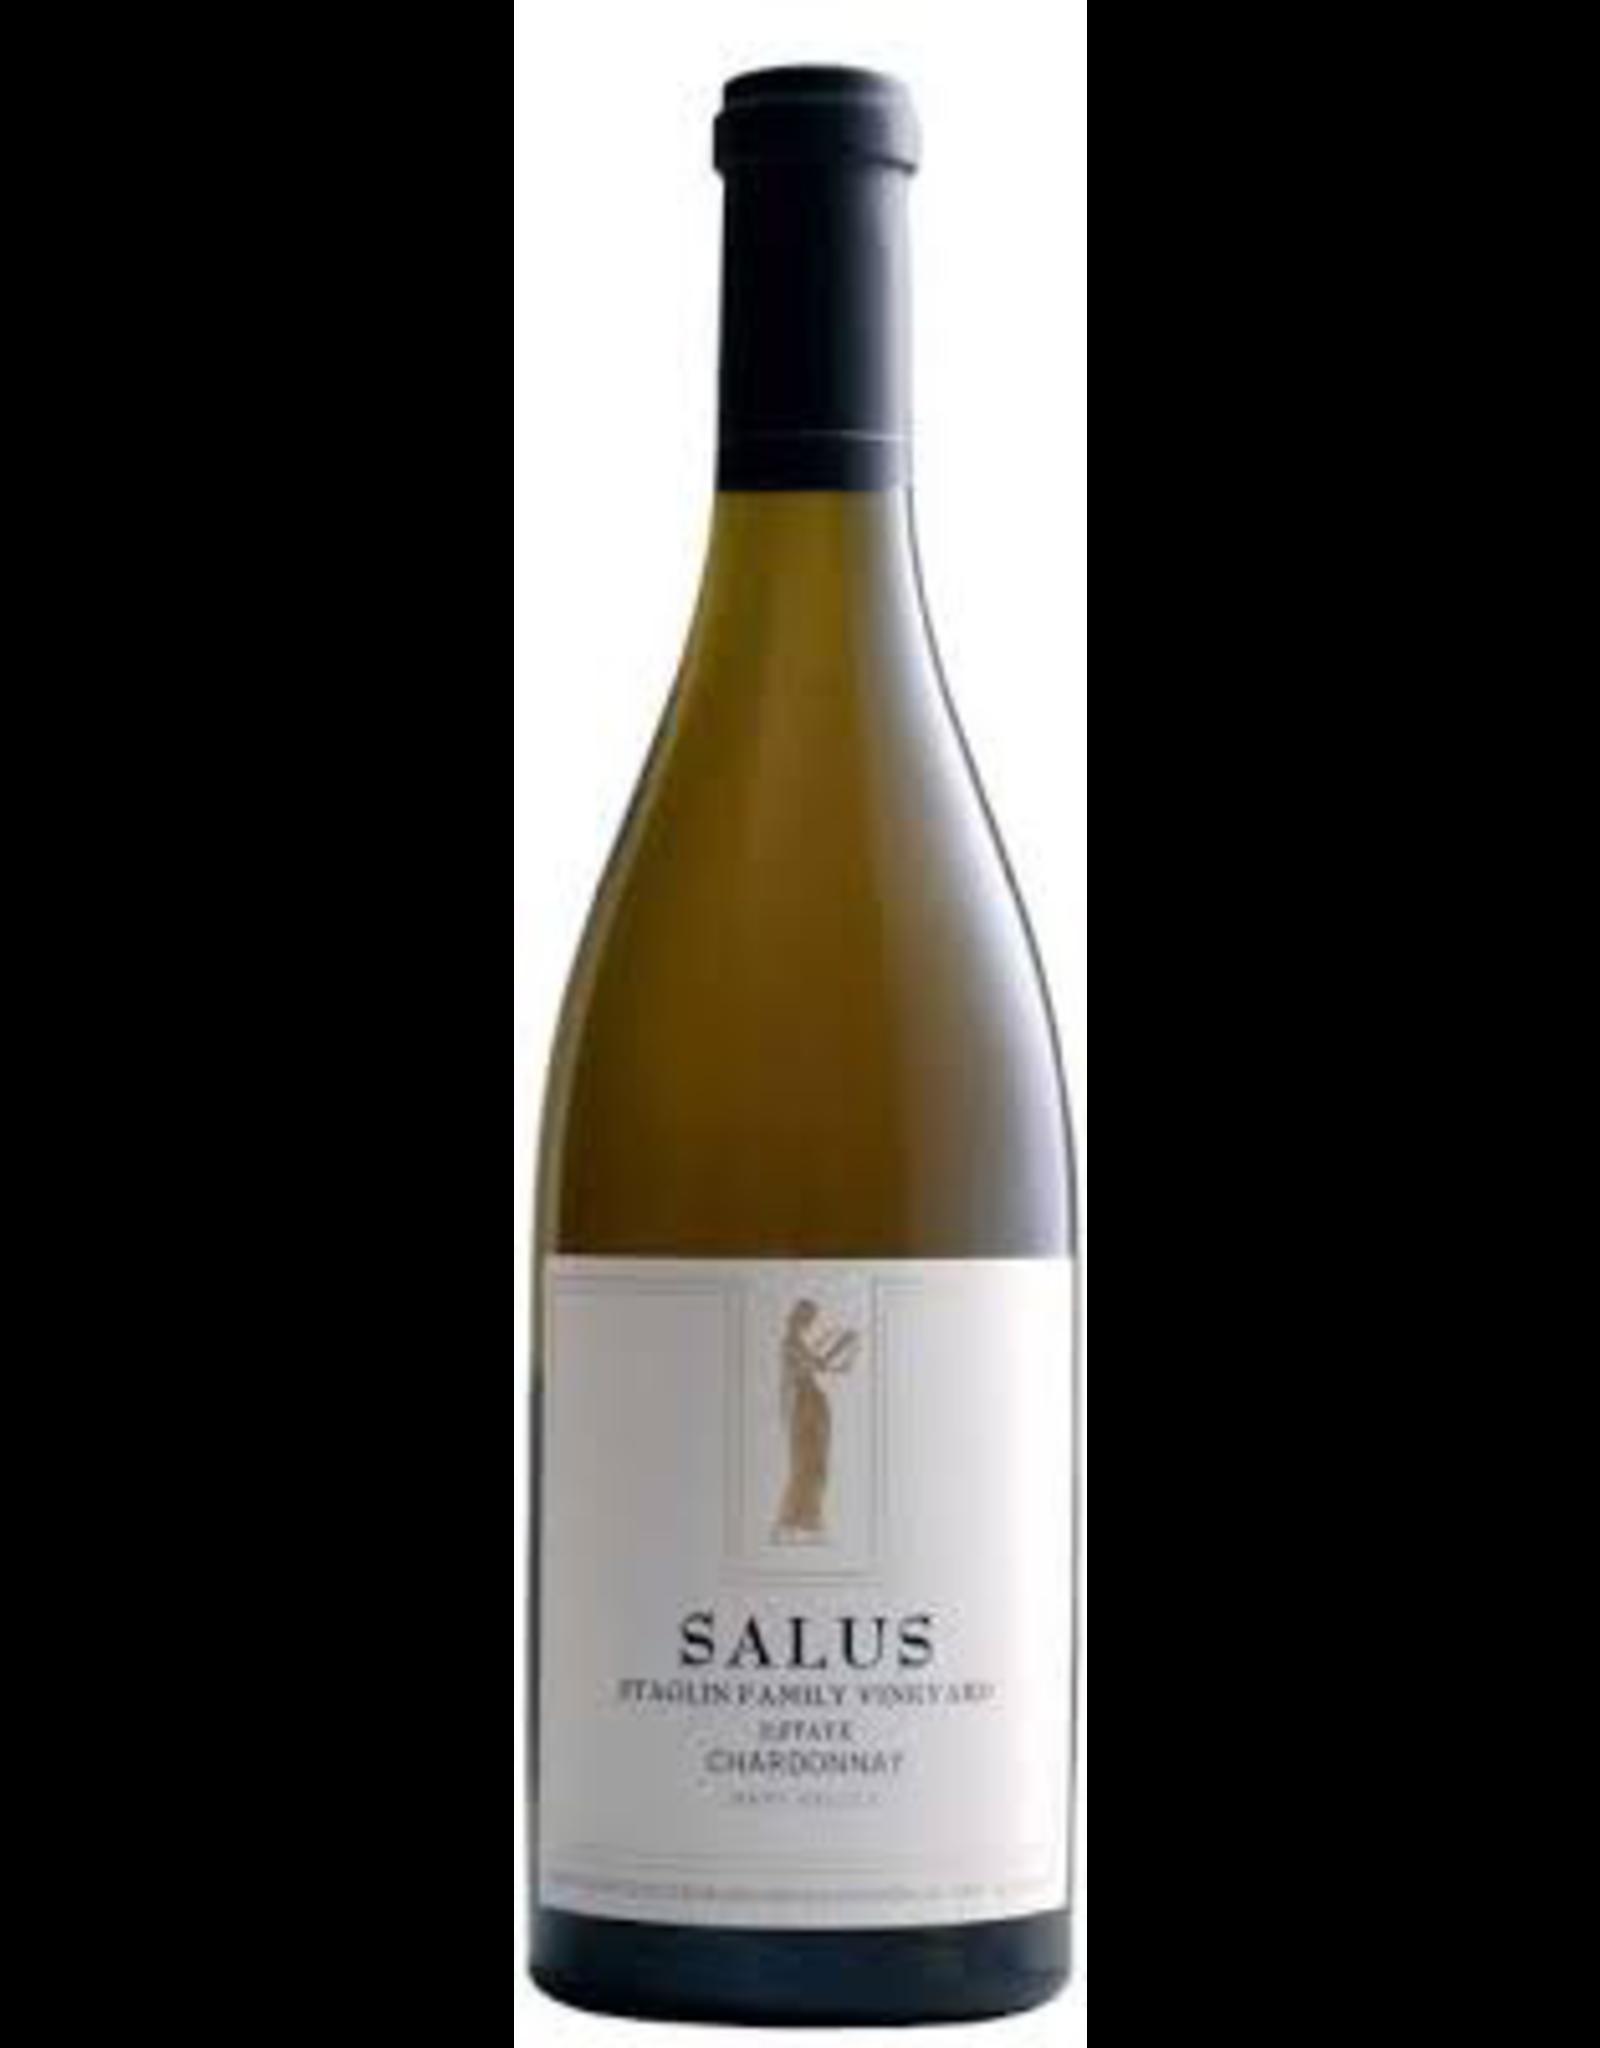 White Wine 2018, Saulus by Staglin, Chardonnay, Rutherford, Napa Valley, California,14.9% Alc, CTnr, TW95